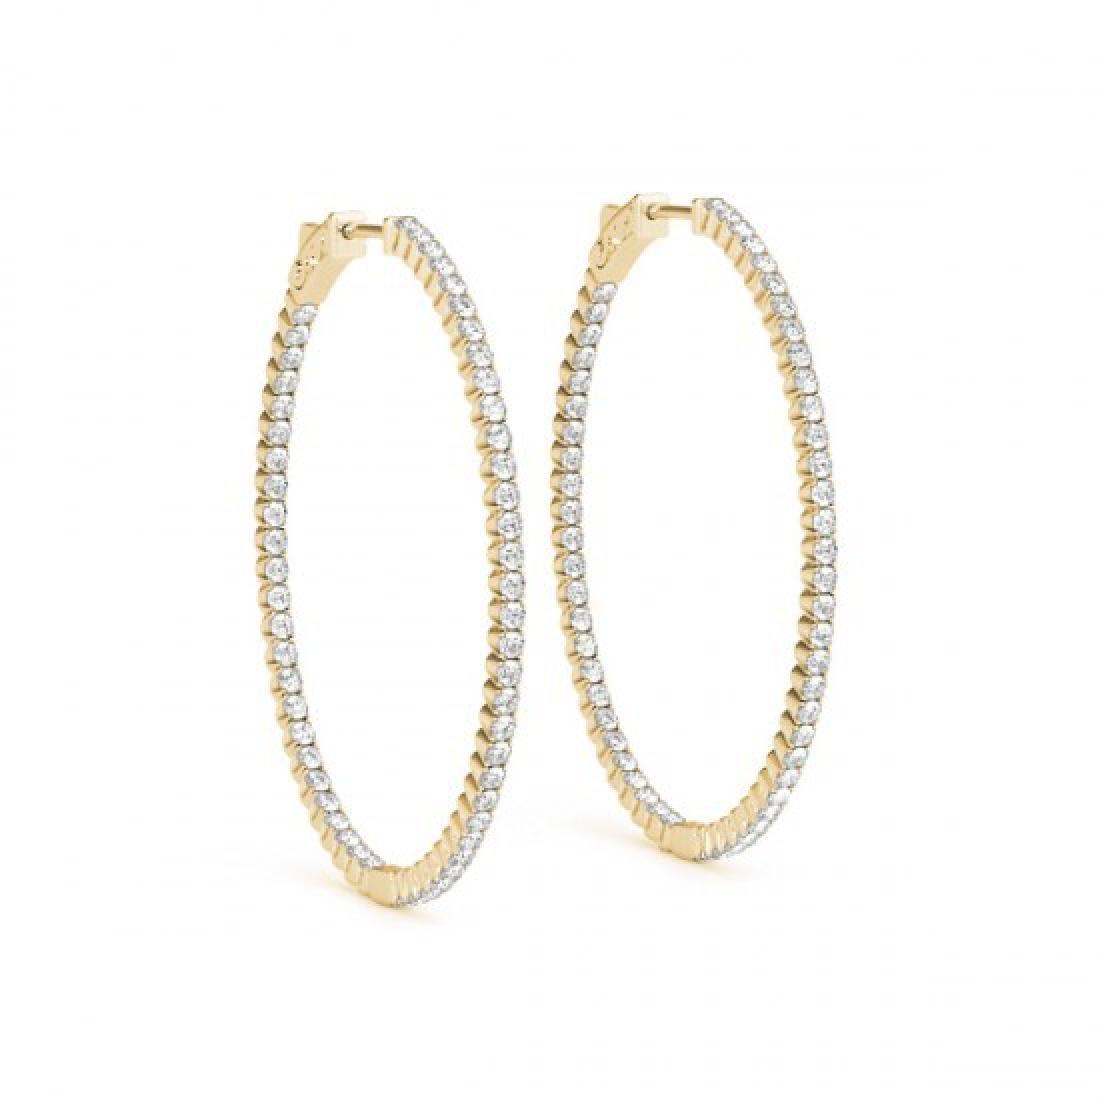 2 CTW Diamond VS/SI Certified 28 Mm Hoop Earrings 14K - 2